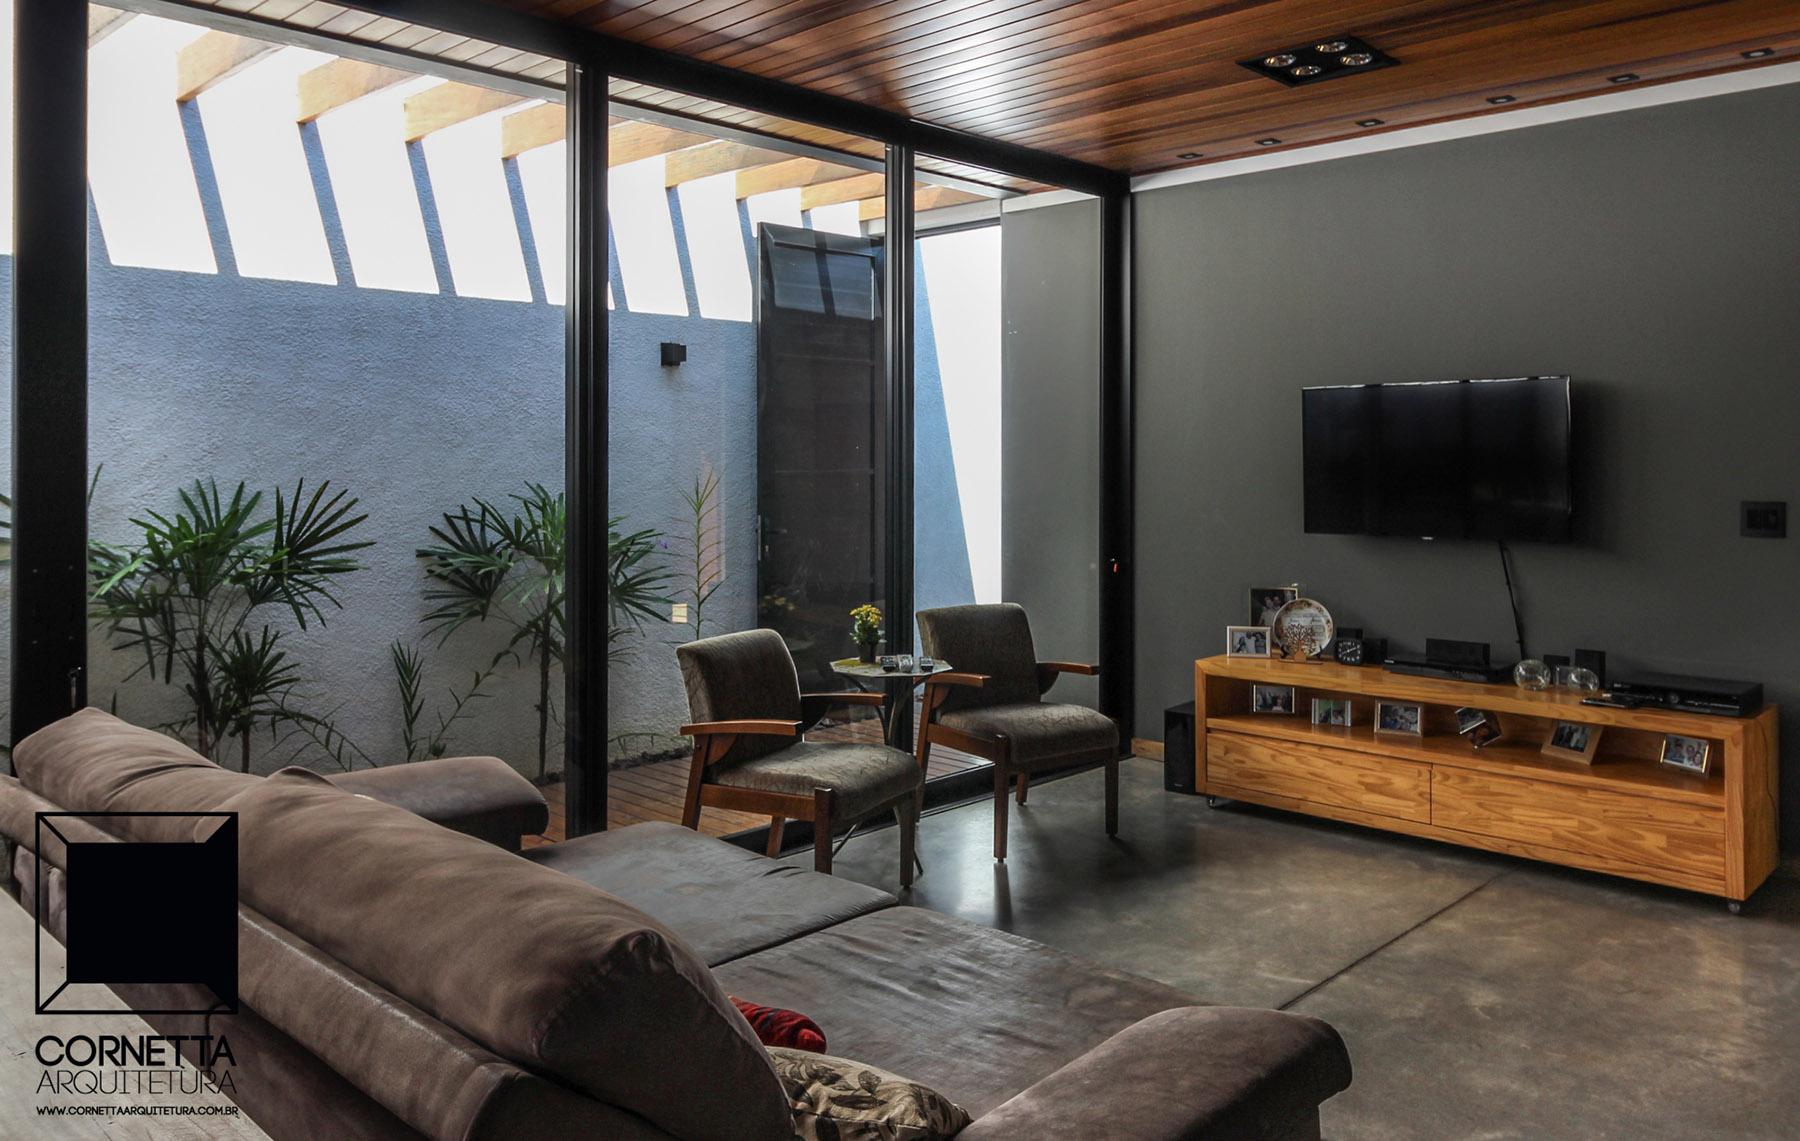 Casa ats cornetta arquitetura - Casas modernas interior ...